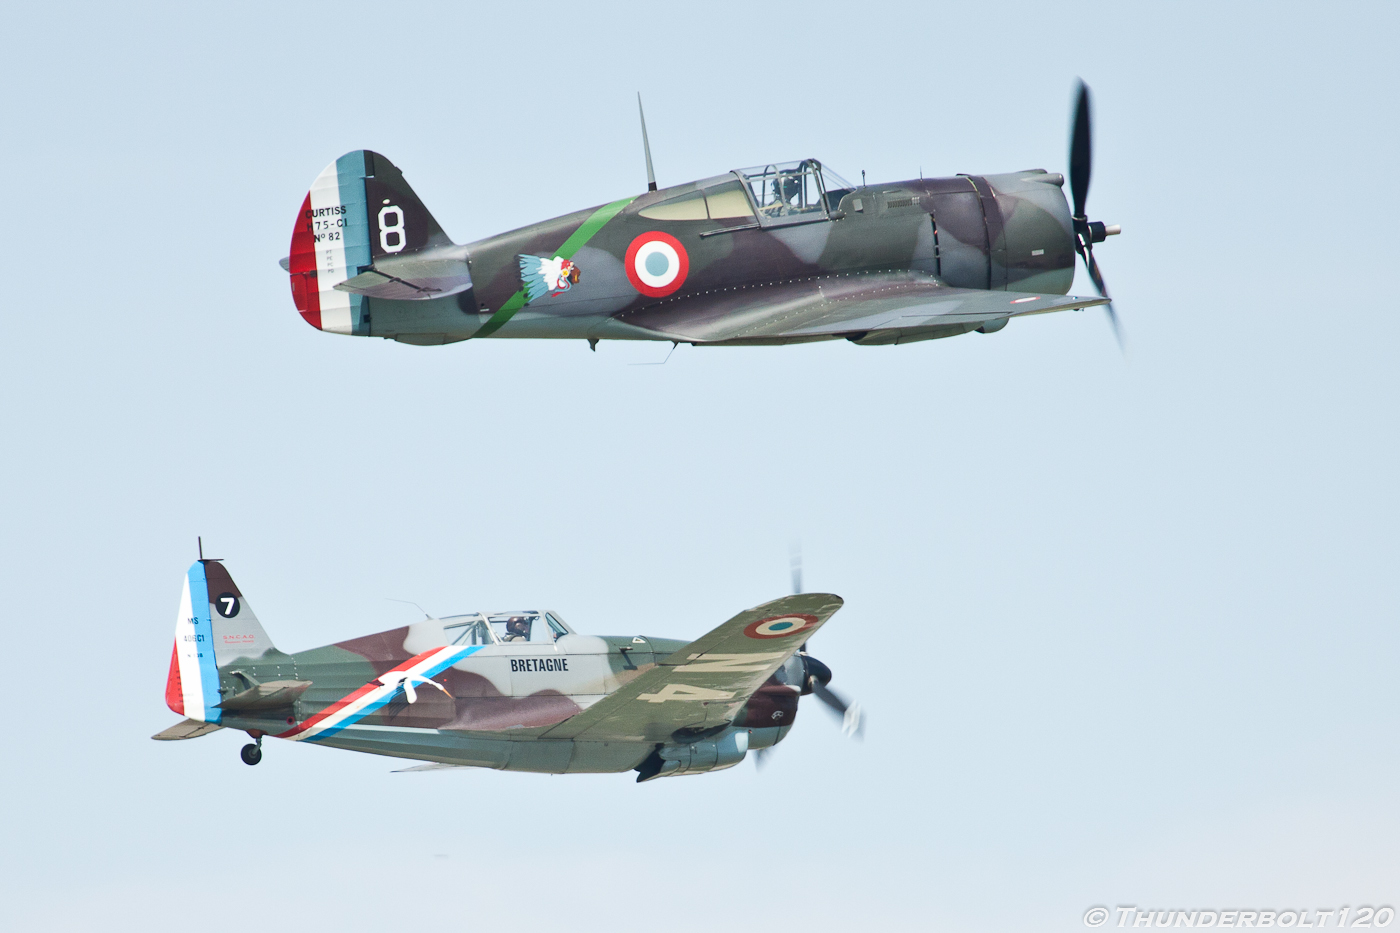 Curtis hawk 75 Morane-Saulnier